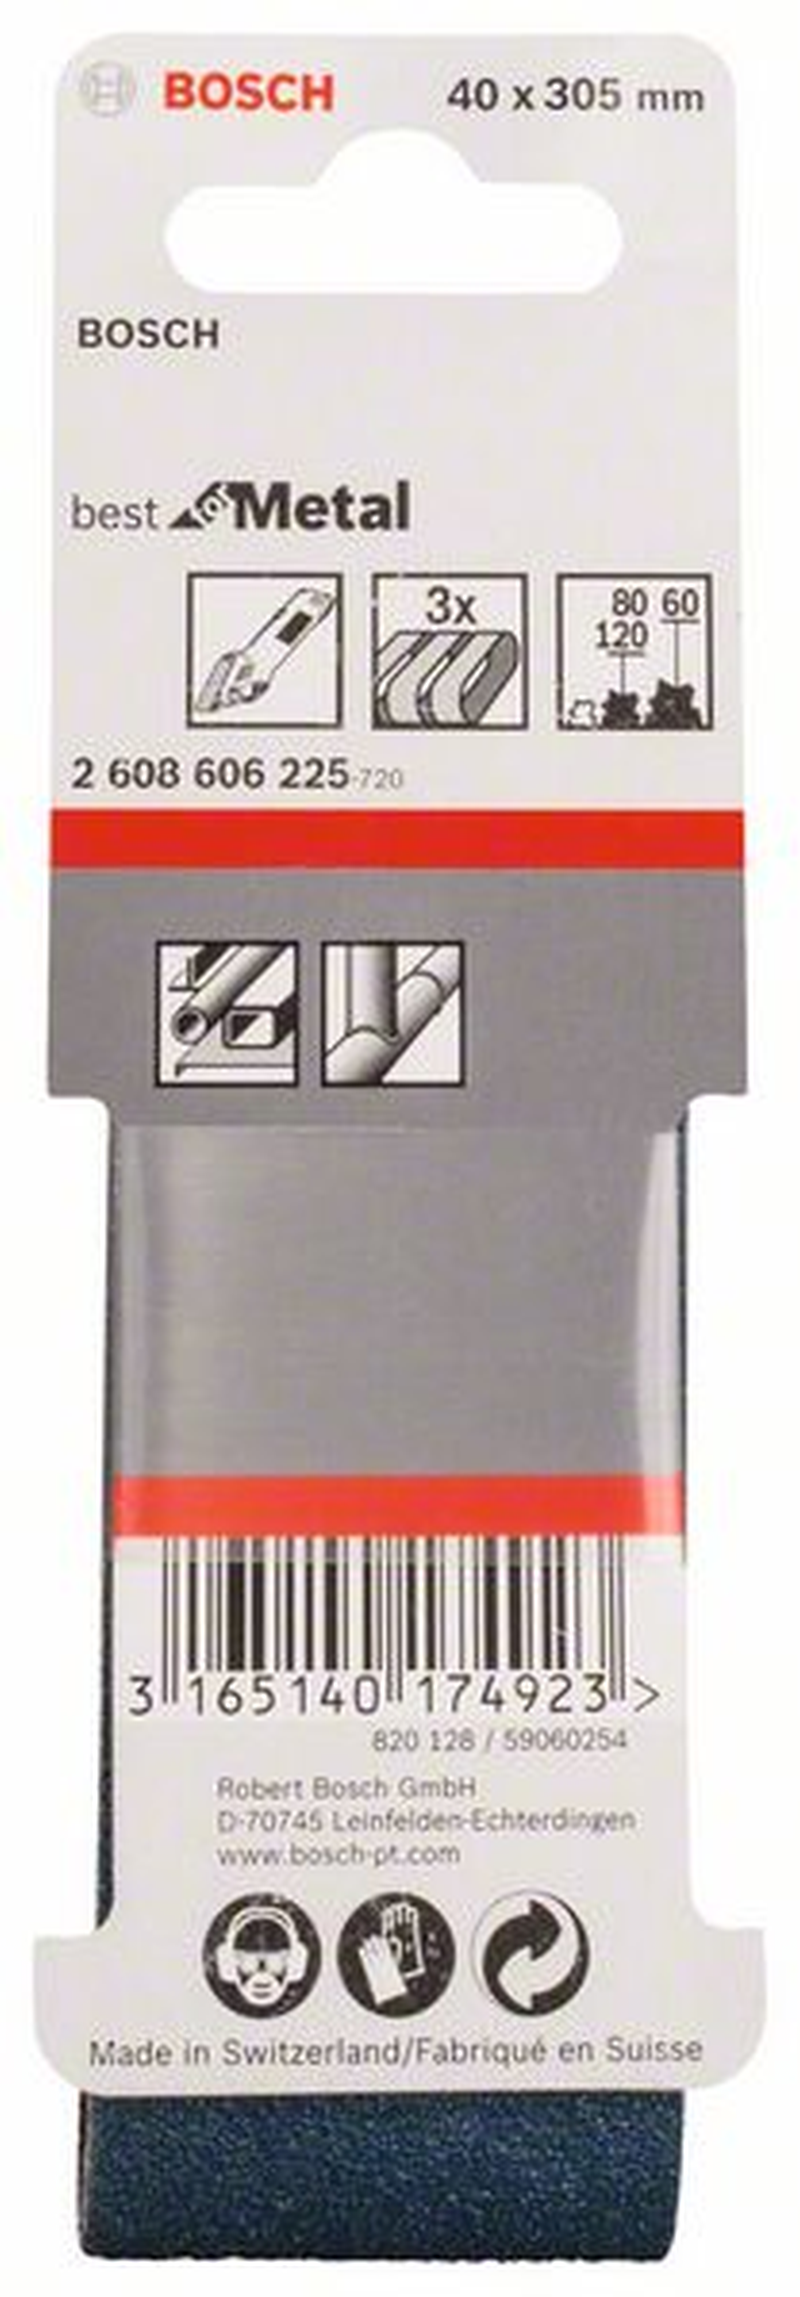 BOSCH 2608606225 Schleifband-Set Best for Metal,3-teilig,40 x 305 mm,60,80,120